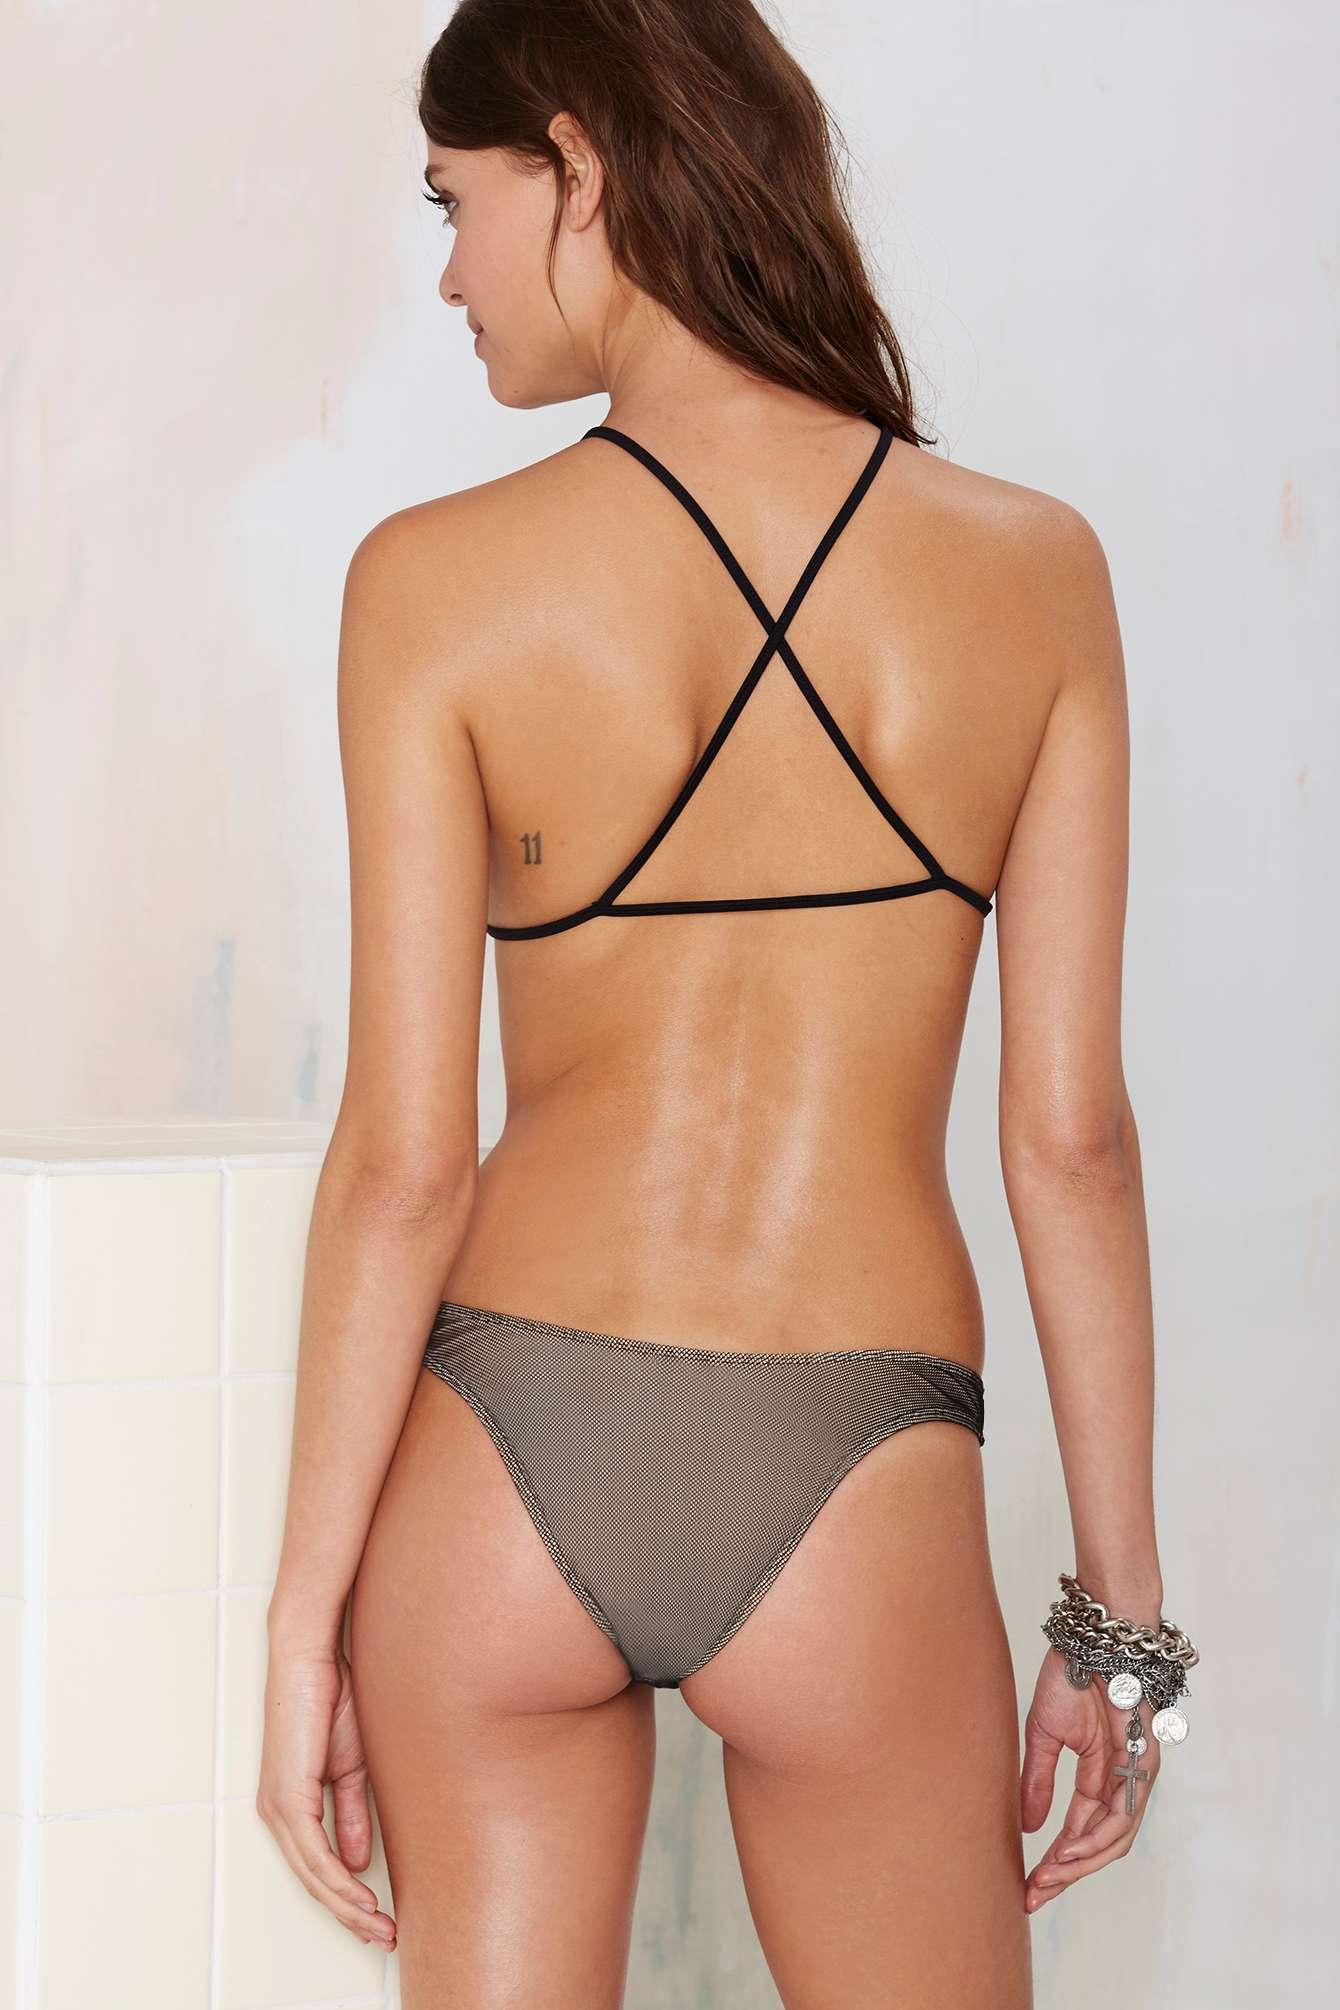 Mesh bikini galleries